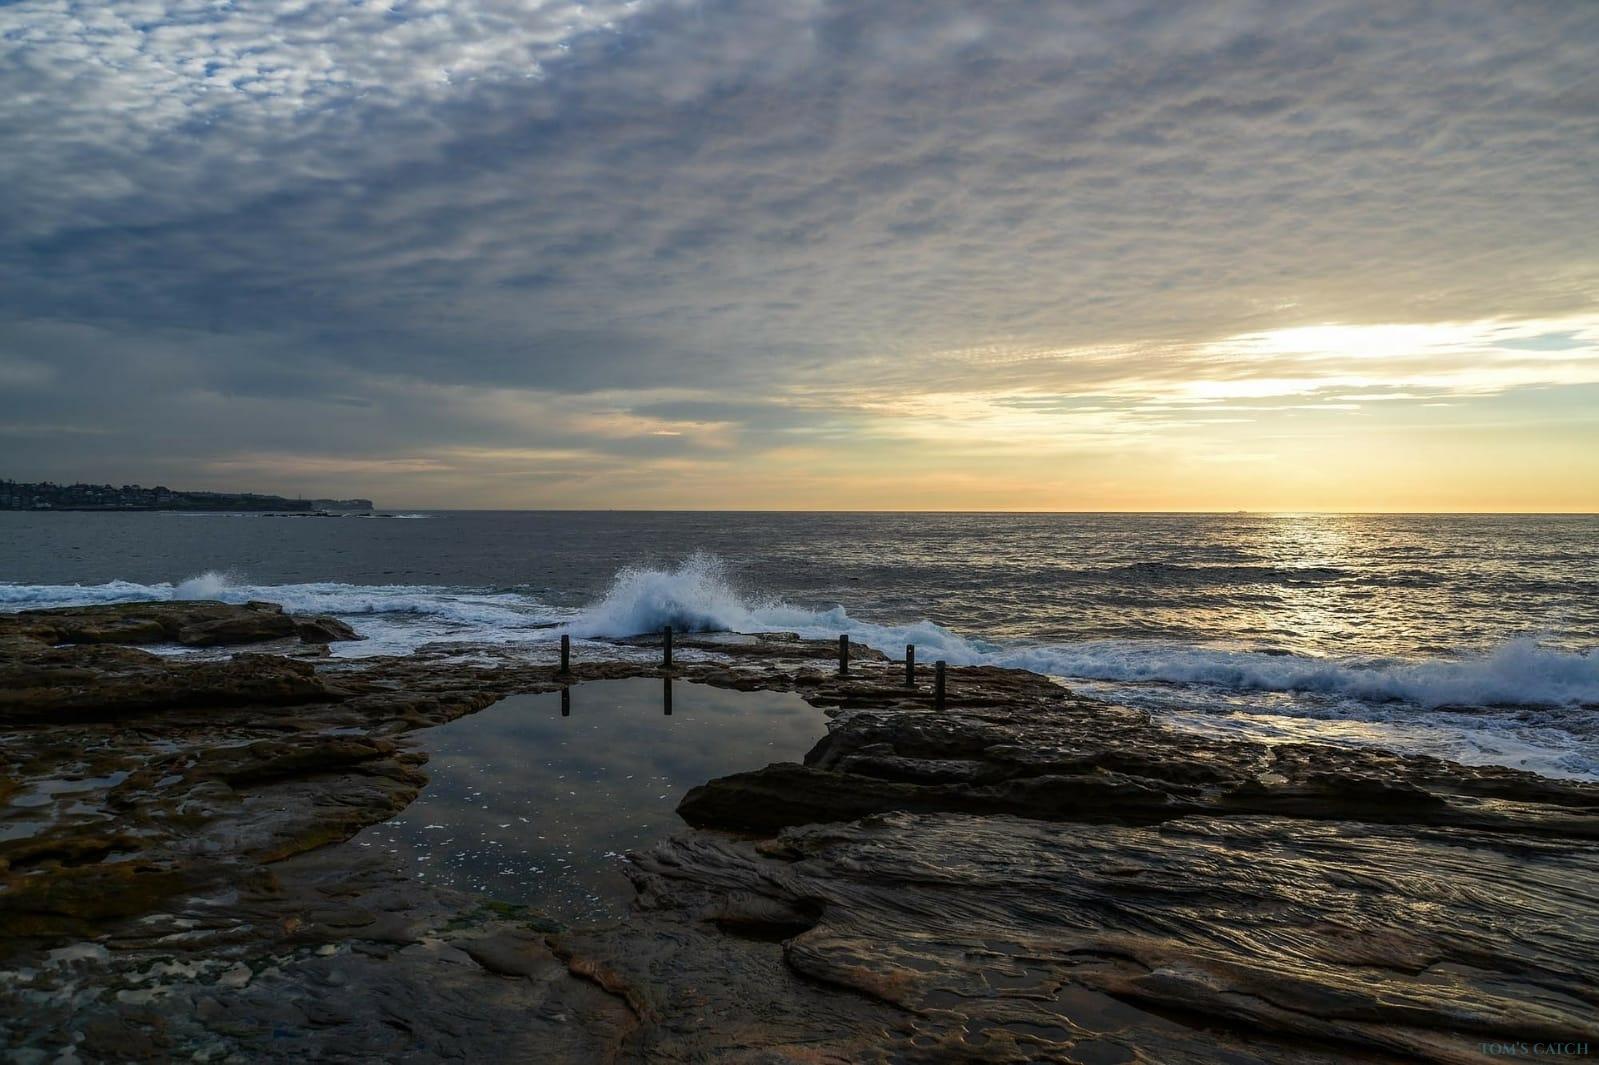 Australia fishing zone